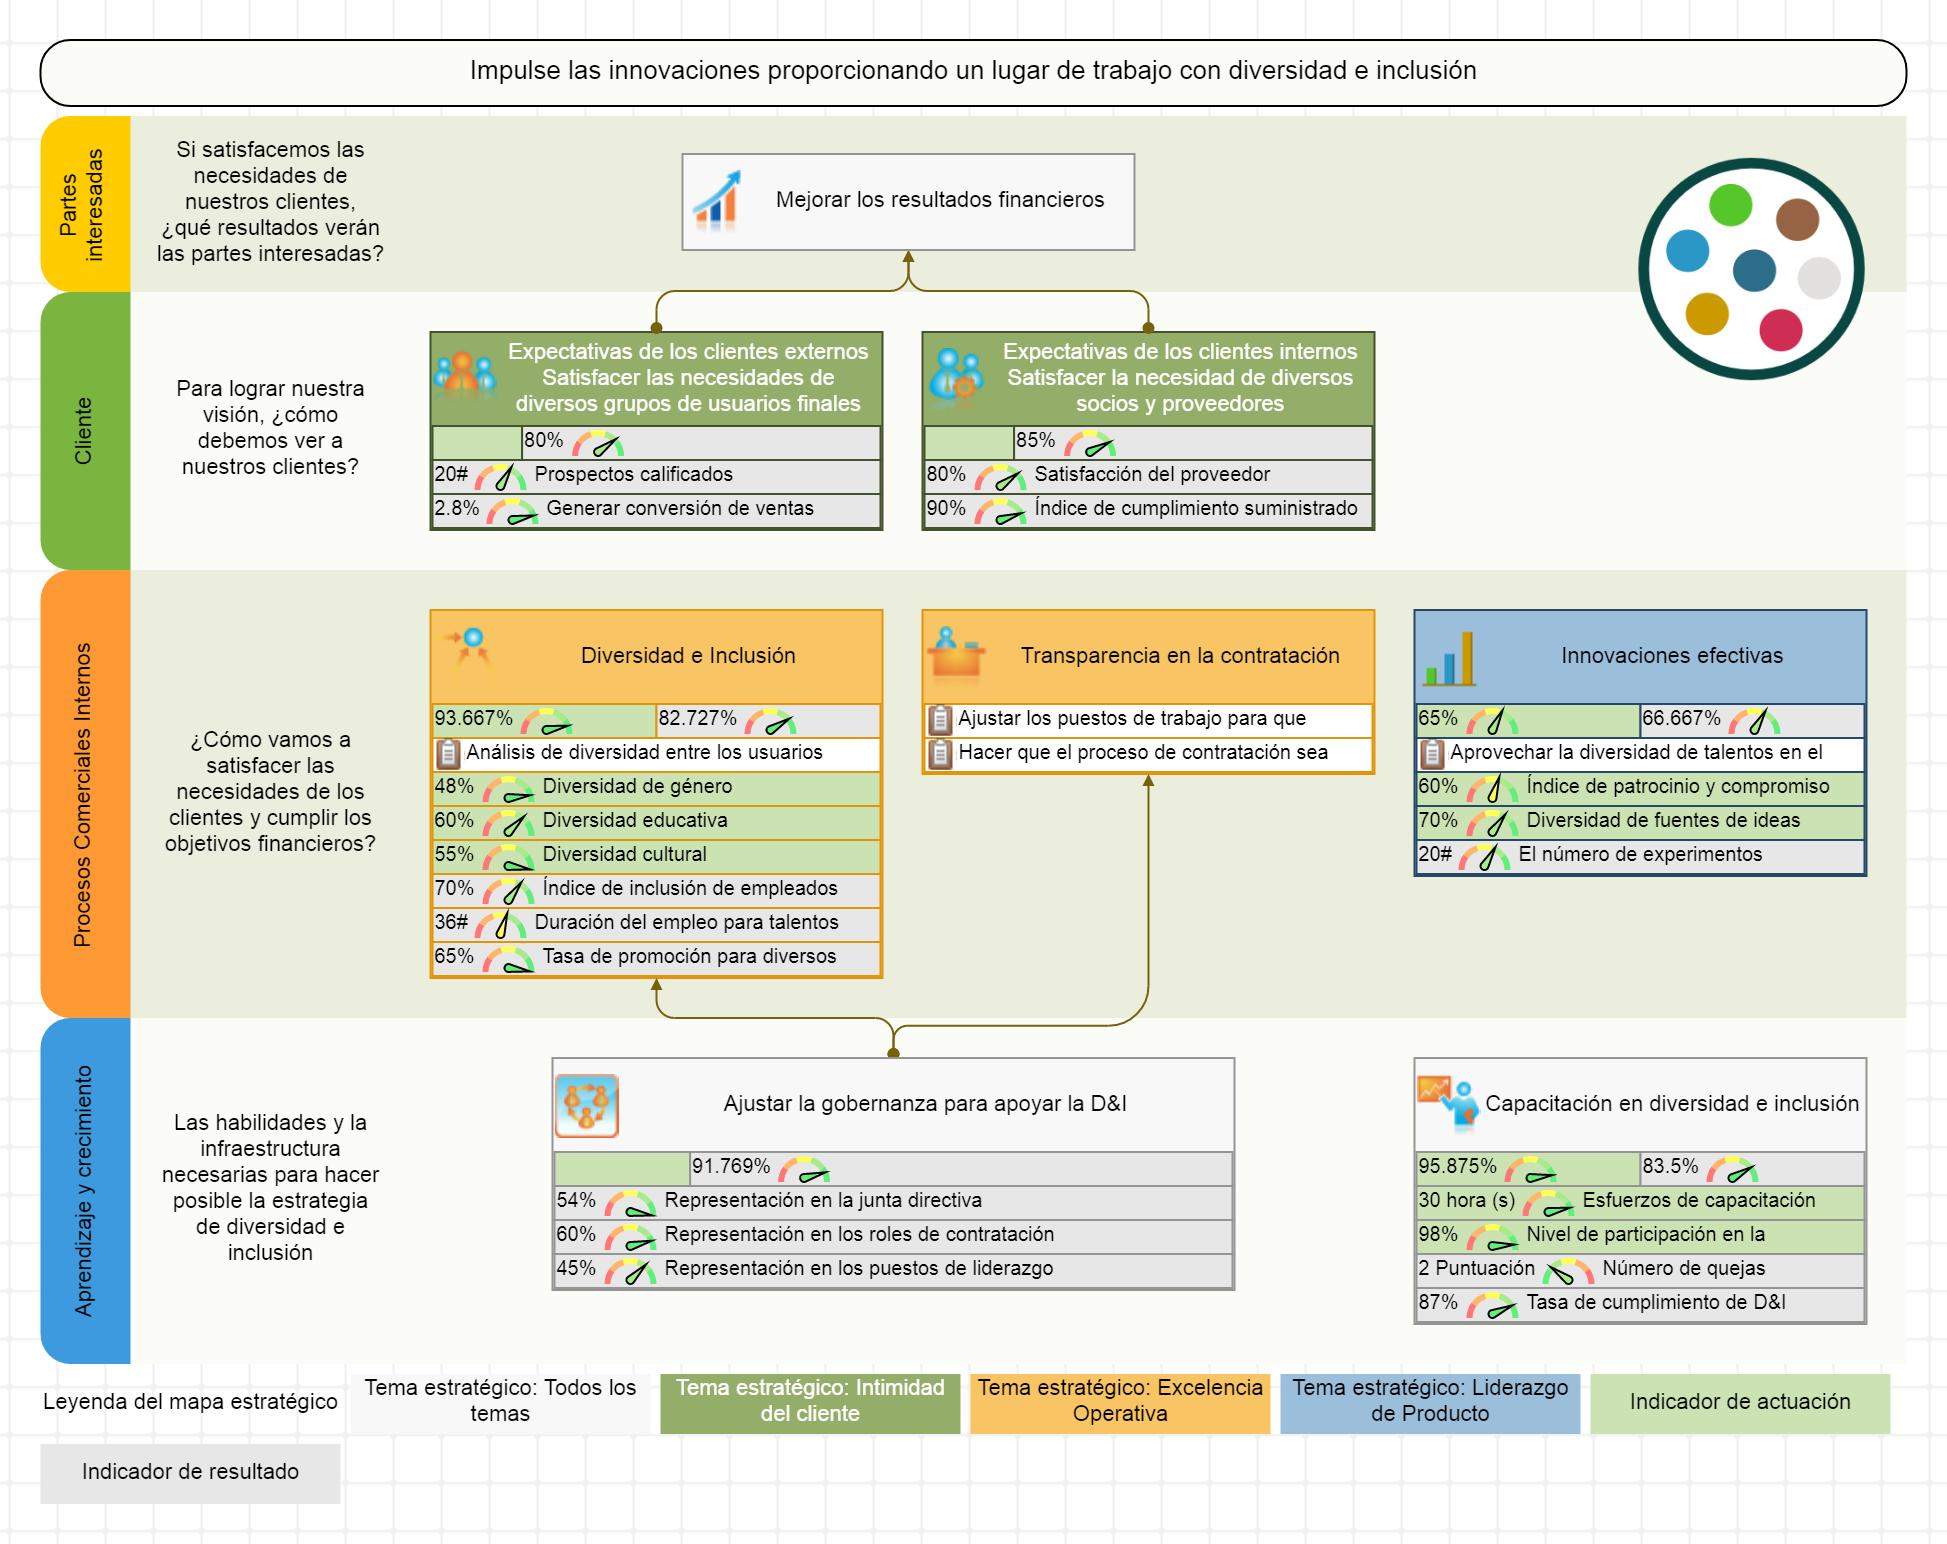 Mapa estratégico para diversidad e inclusión